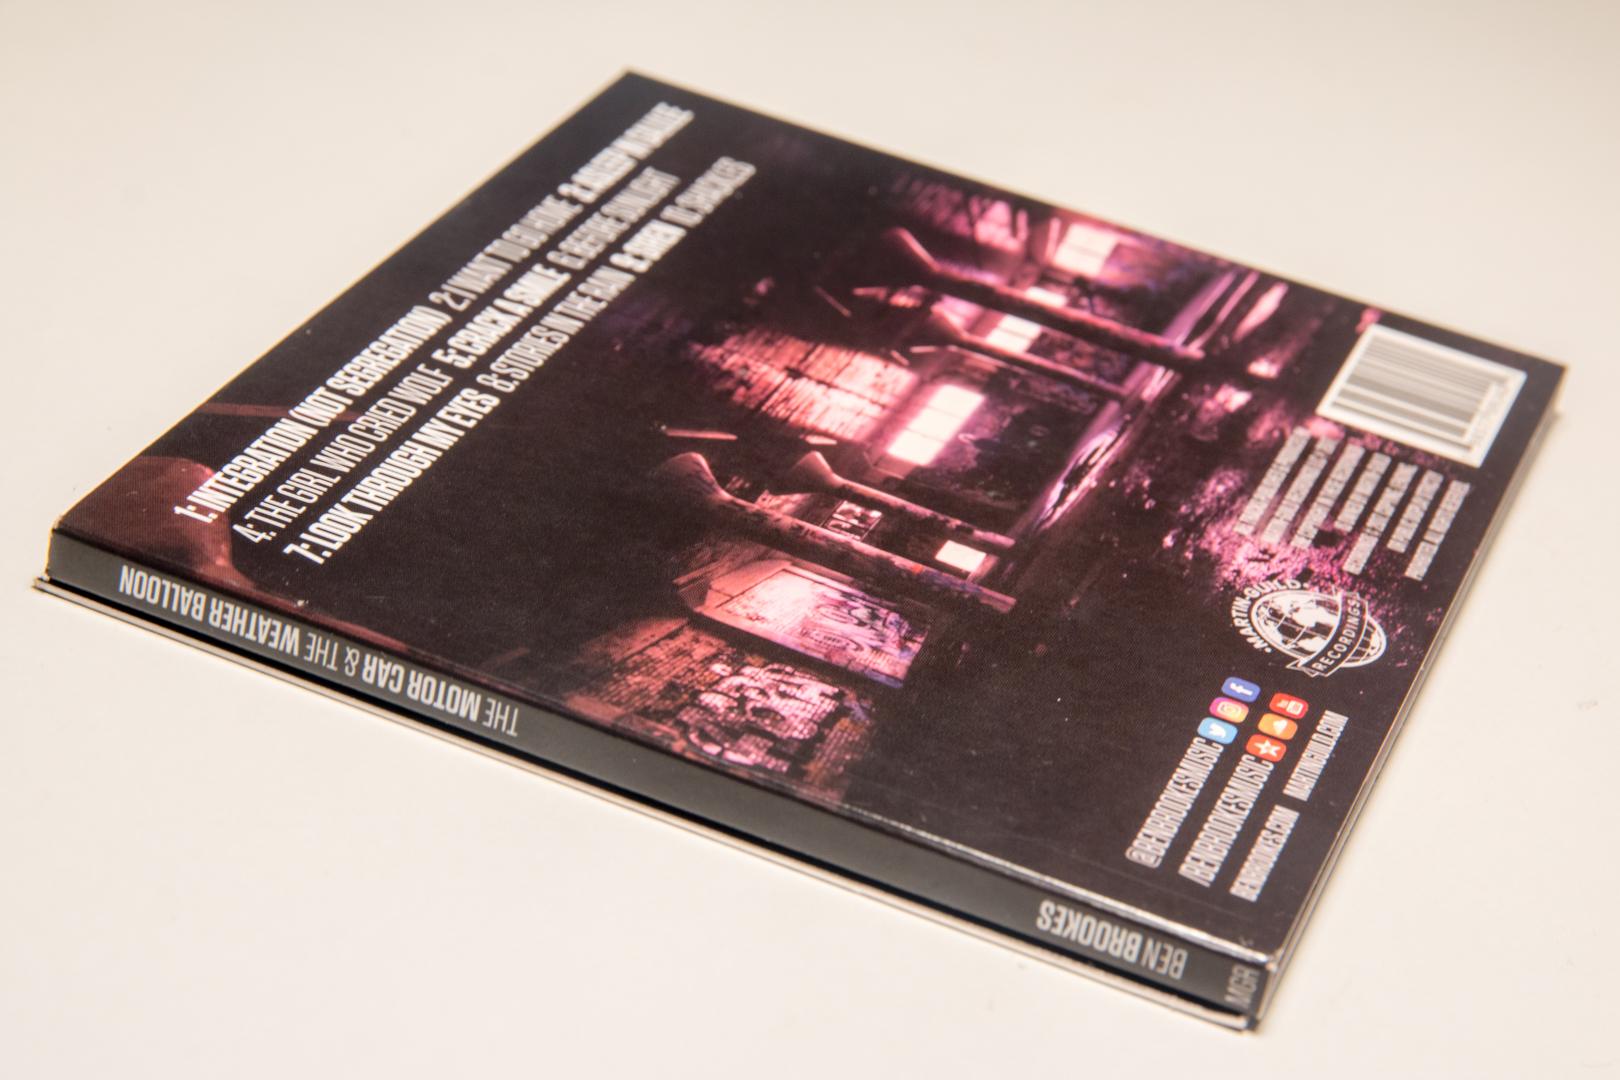 Ben Brookes The Motor Car & The Weather Balloon CD -3.jpg